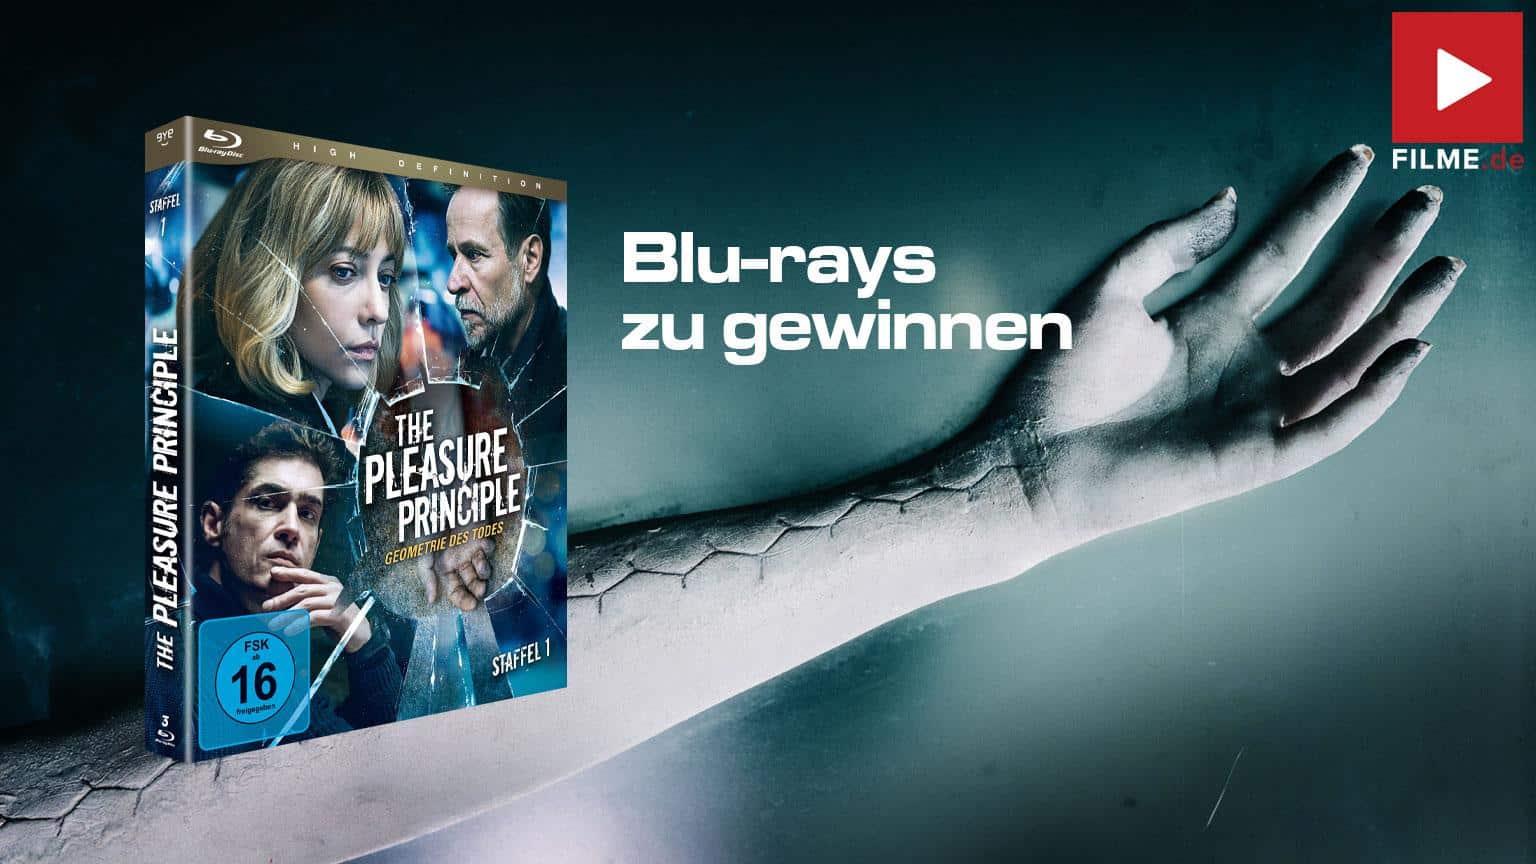 The Pleasure Principle Serie 2020 gewinnspiel gewinnen Artikelbild shop kaufen Blu-ray DVD